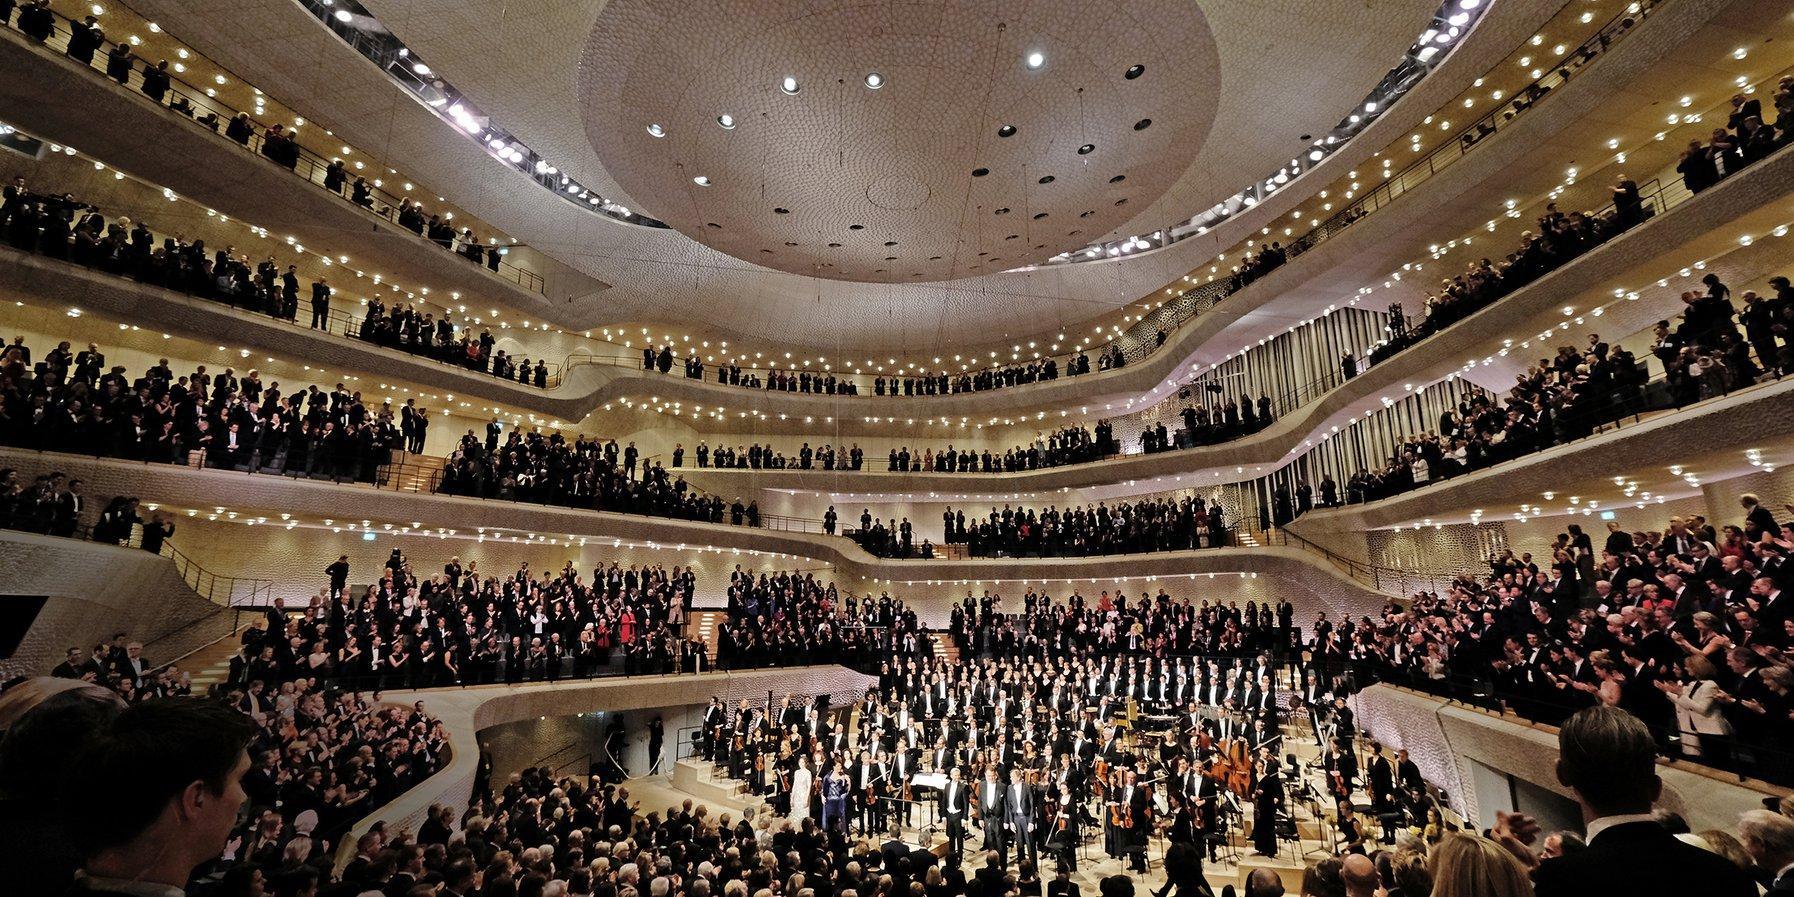 Opening Concert